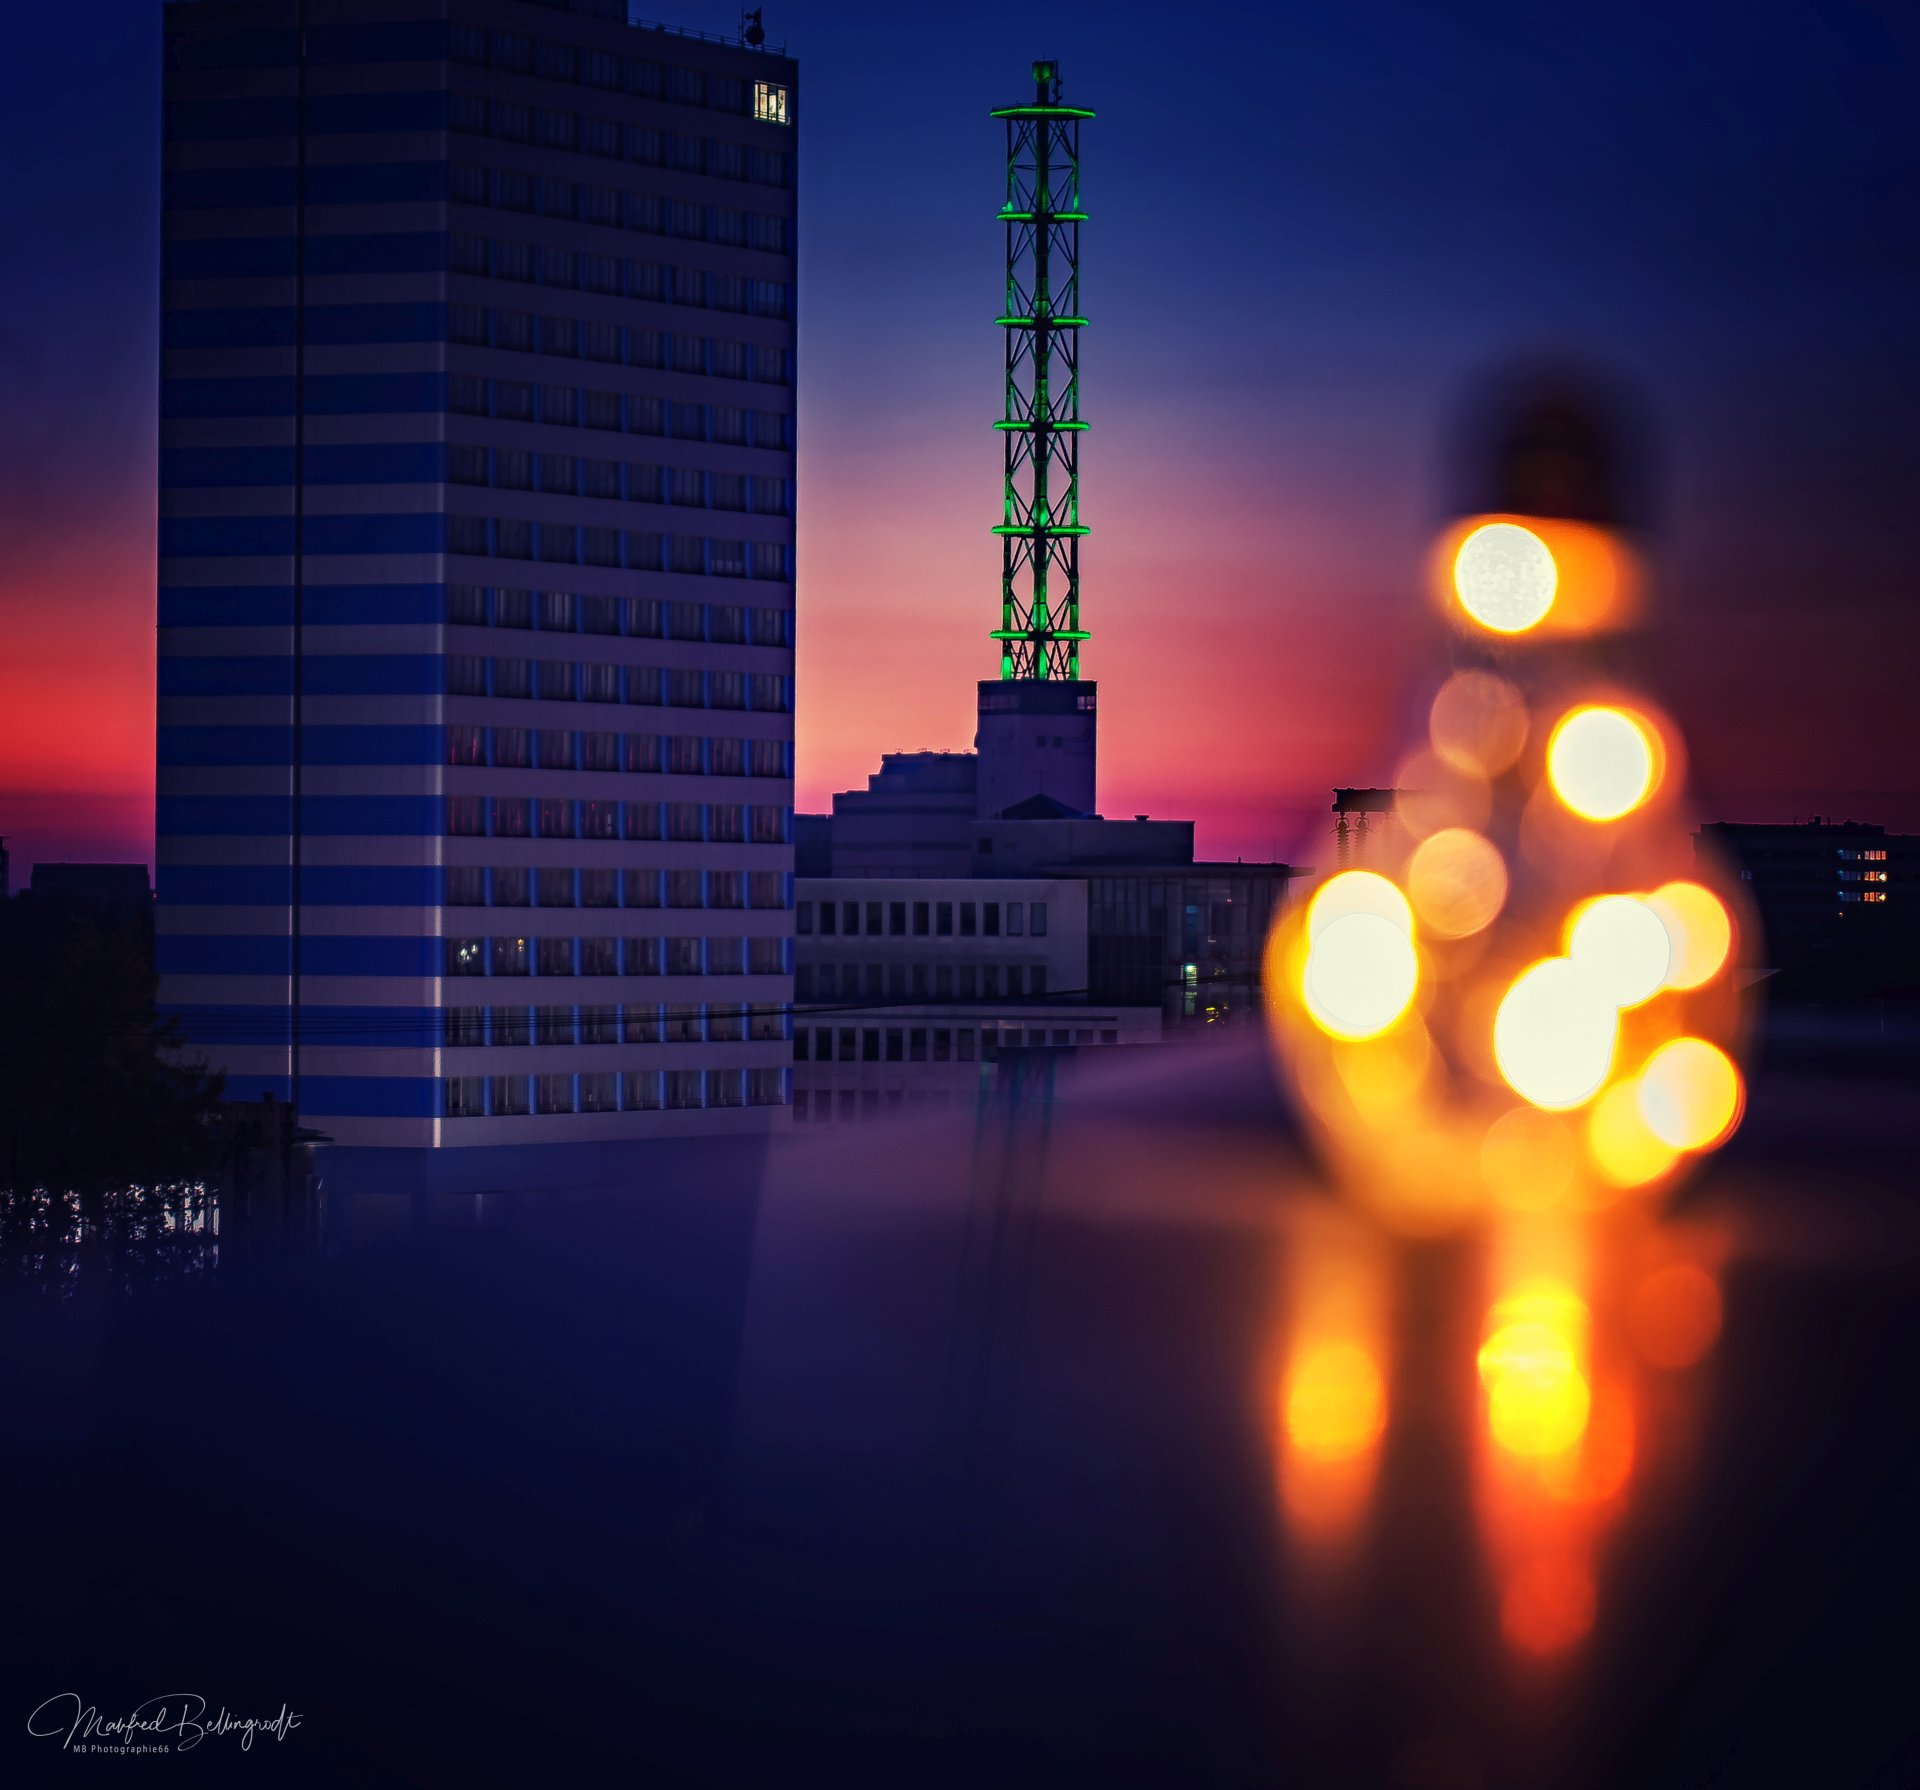 UCi Parrkhausdach Glühbirne+Turm